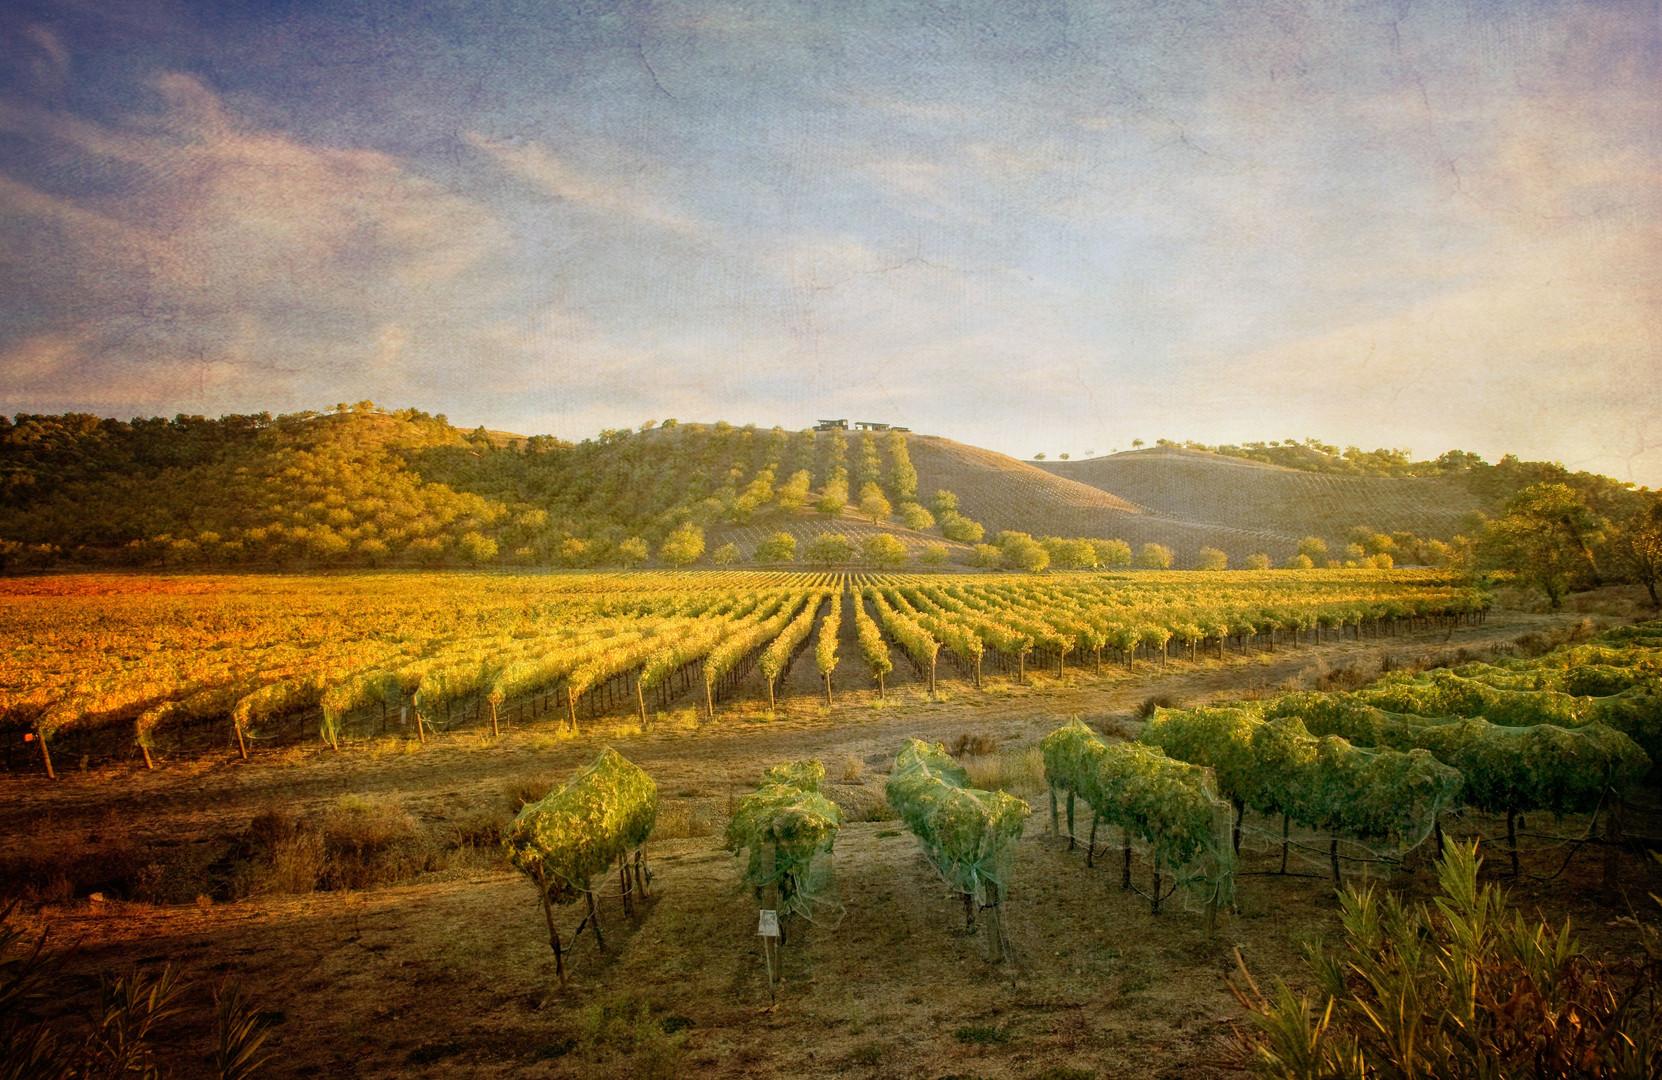 paso-robles-vineyard-120515553-5c2009b54